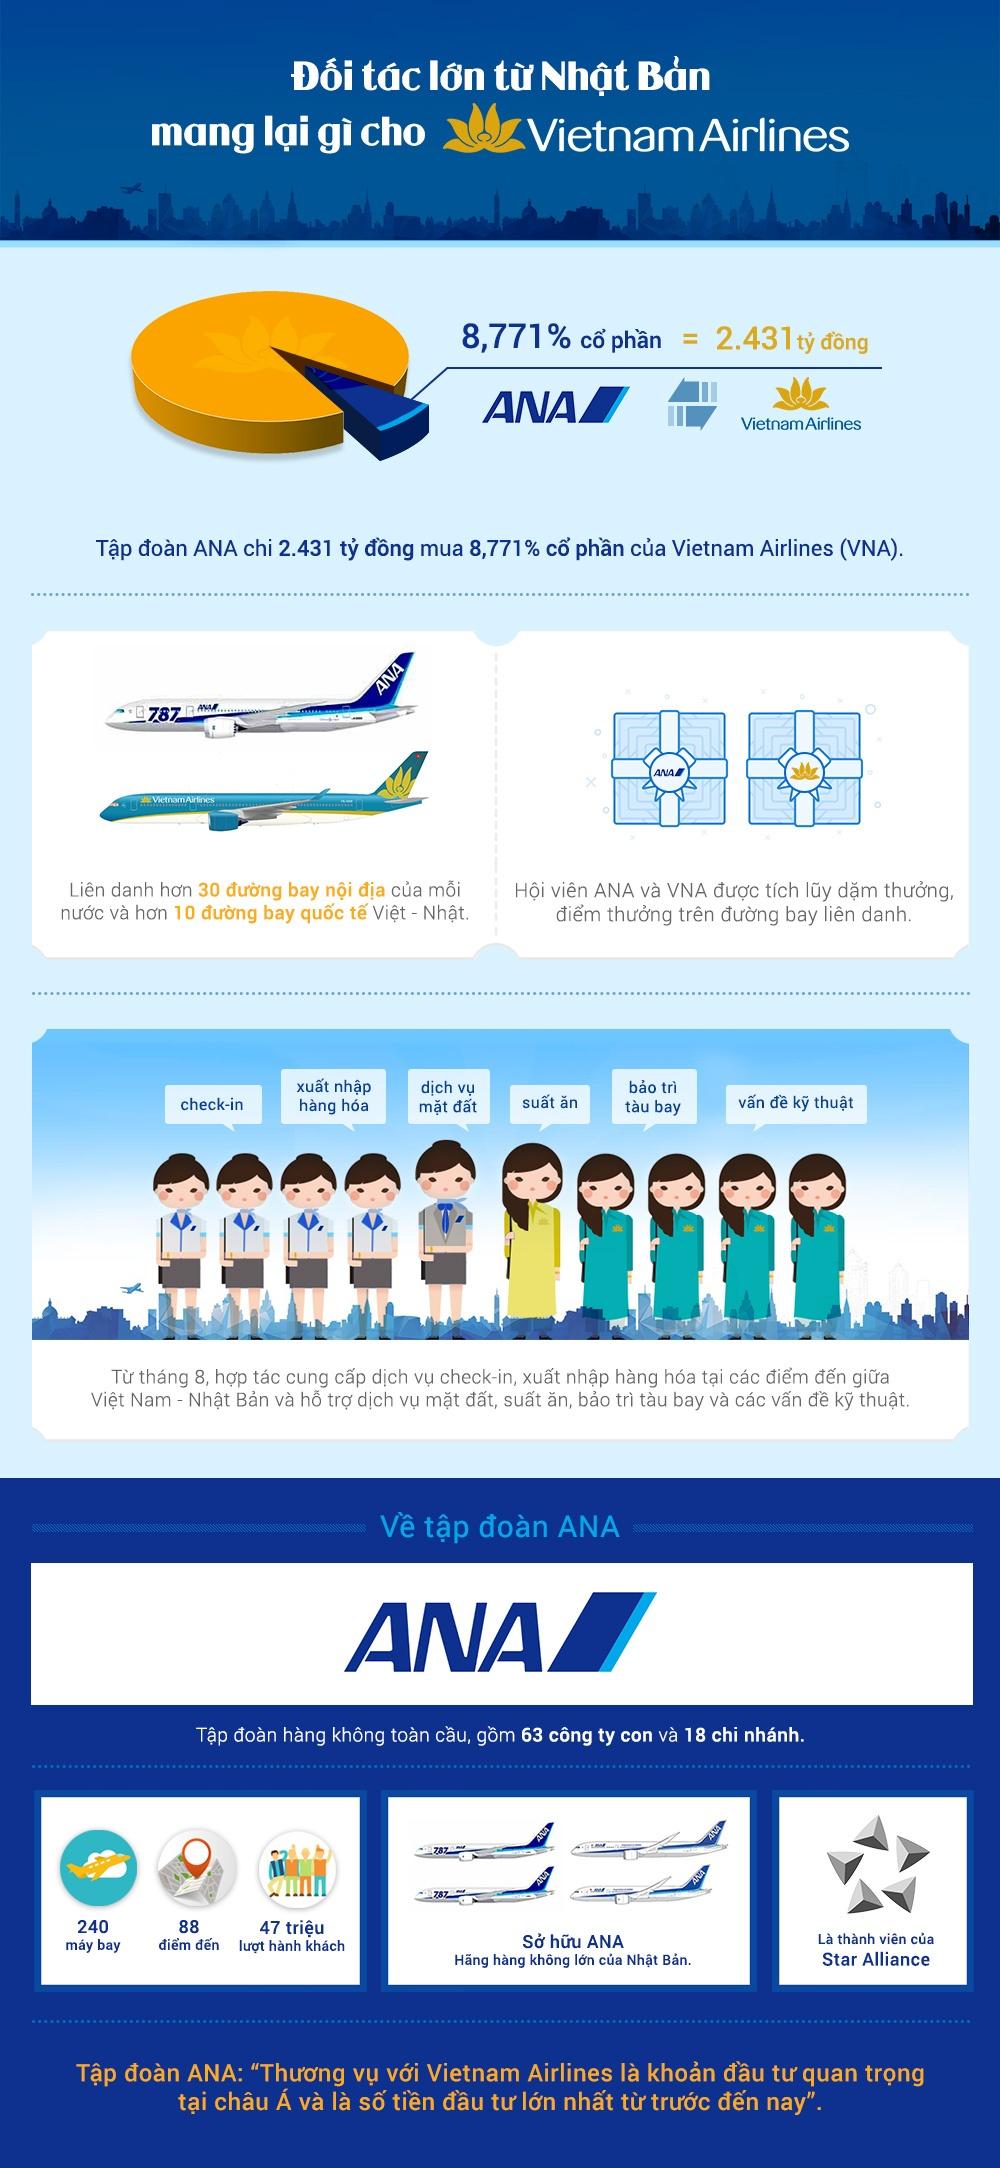 Doi tac lon tu Nhat Ban mang lai gi cho Vietnam Airlines? hinh anh 1